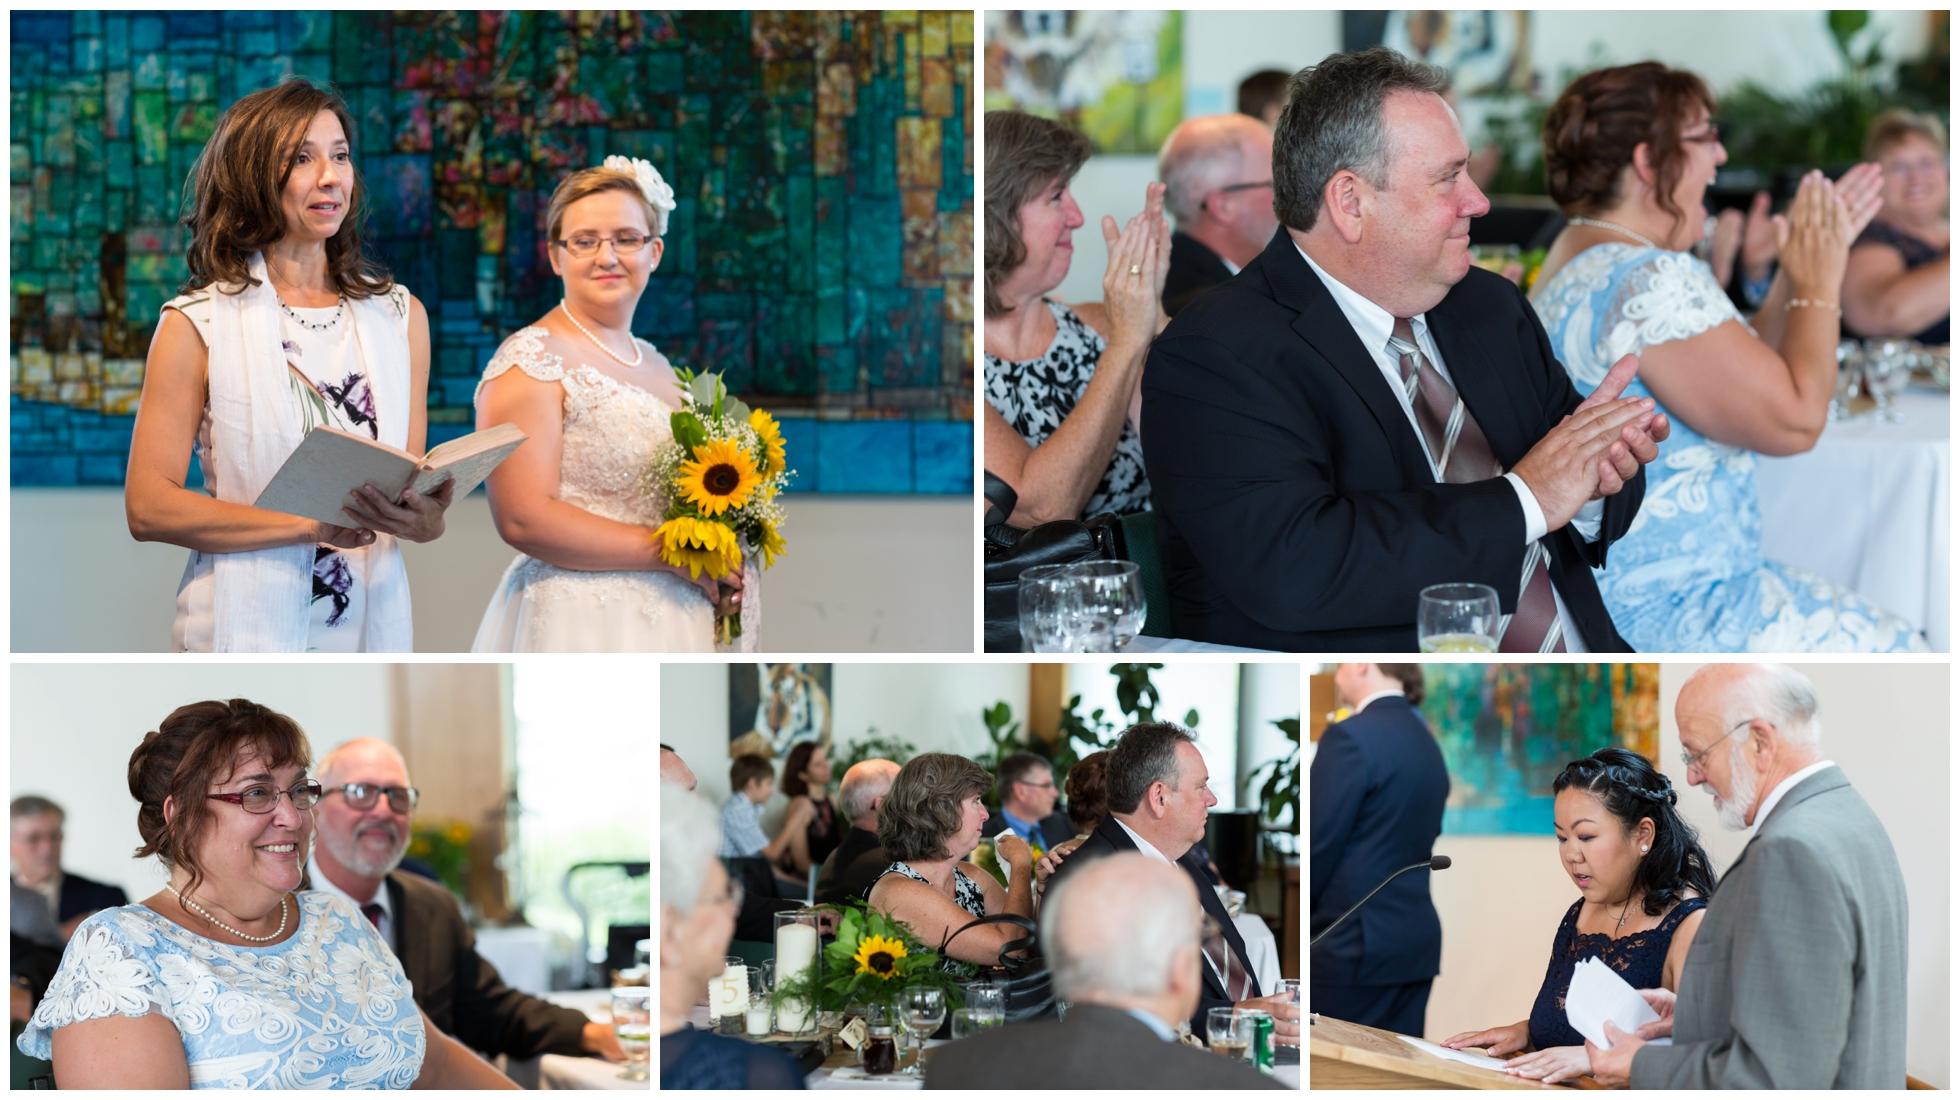 Toronto Wedding Chris Kate (Selena Phillips-Boyle)_0005.jpg